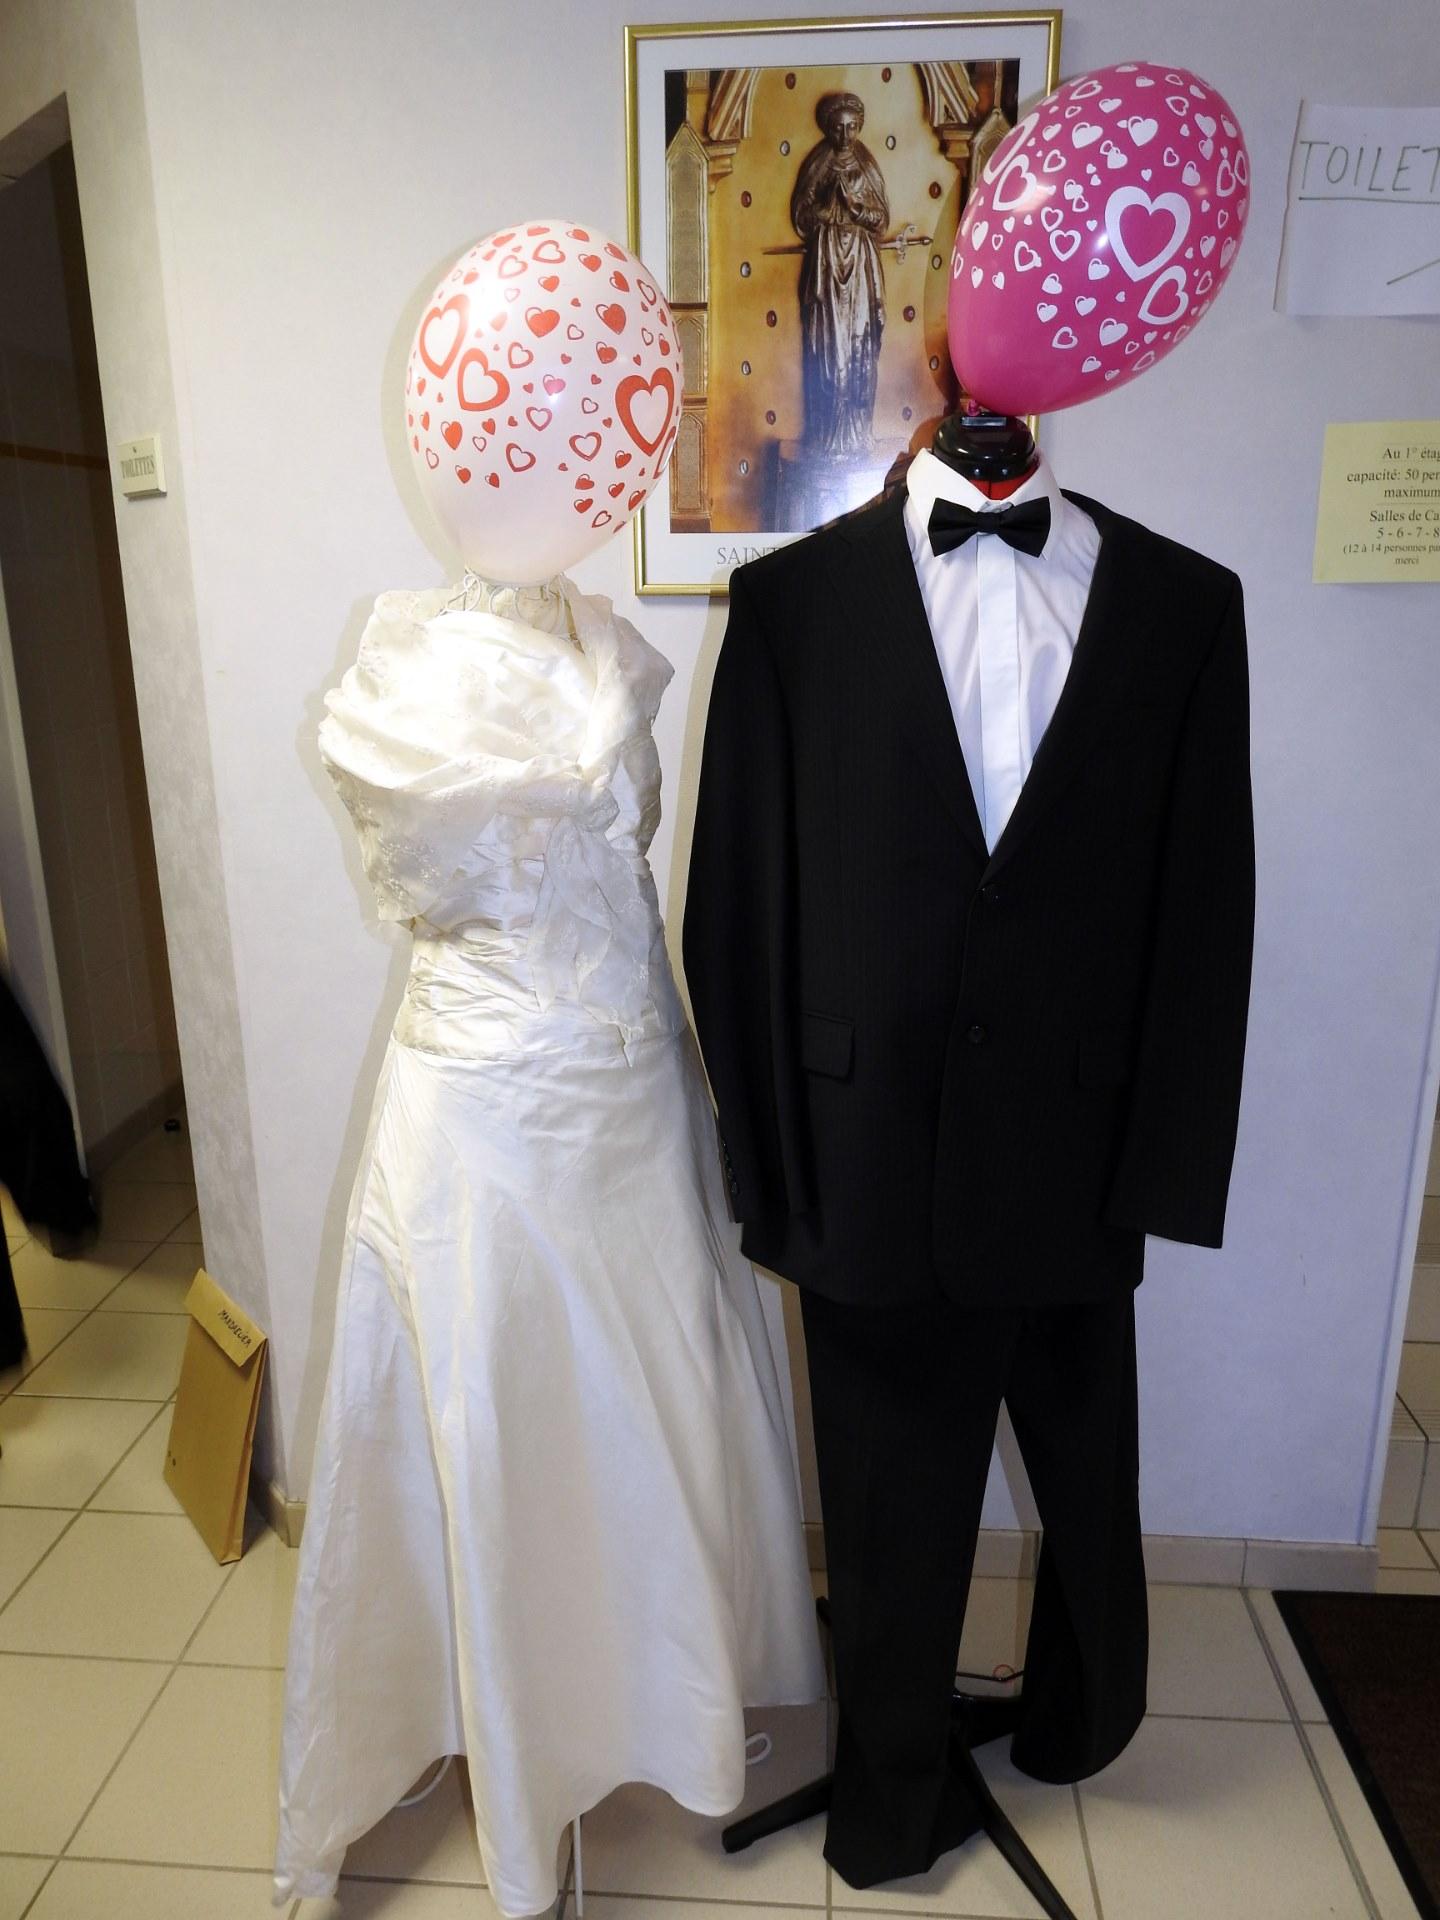 2018_03_16-08-Caudry (59)-Preparation au mariage